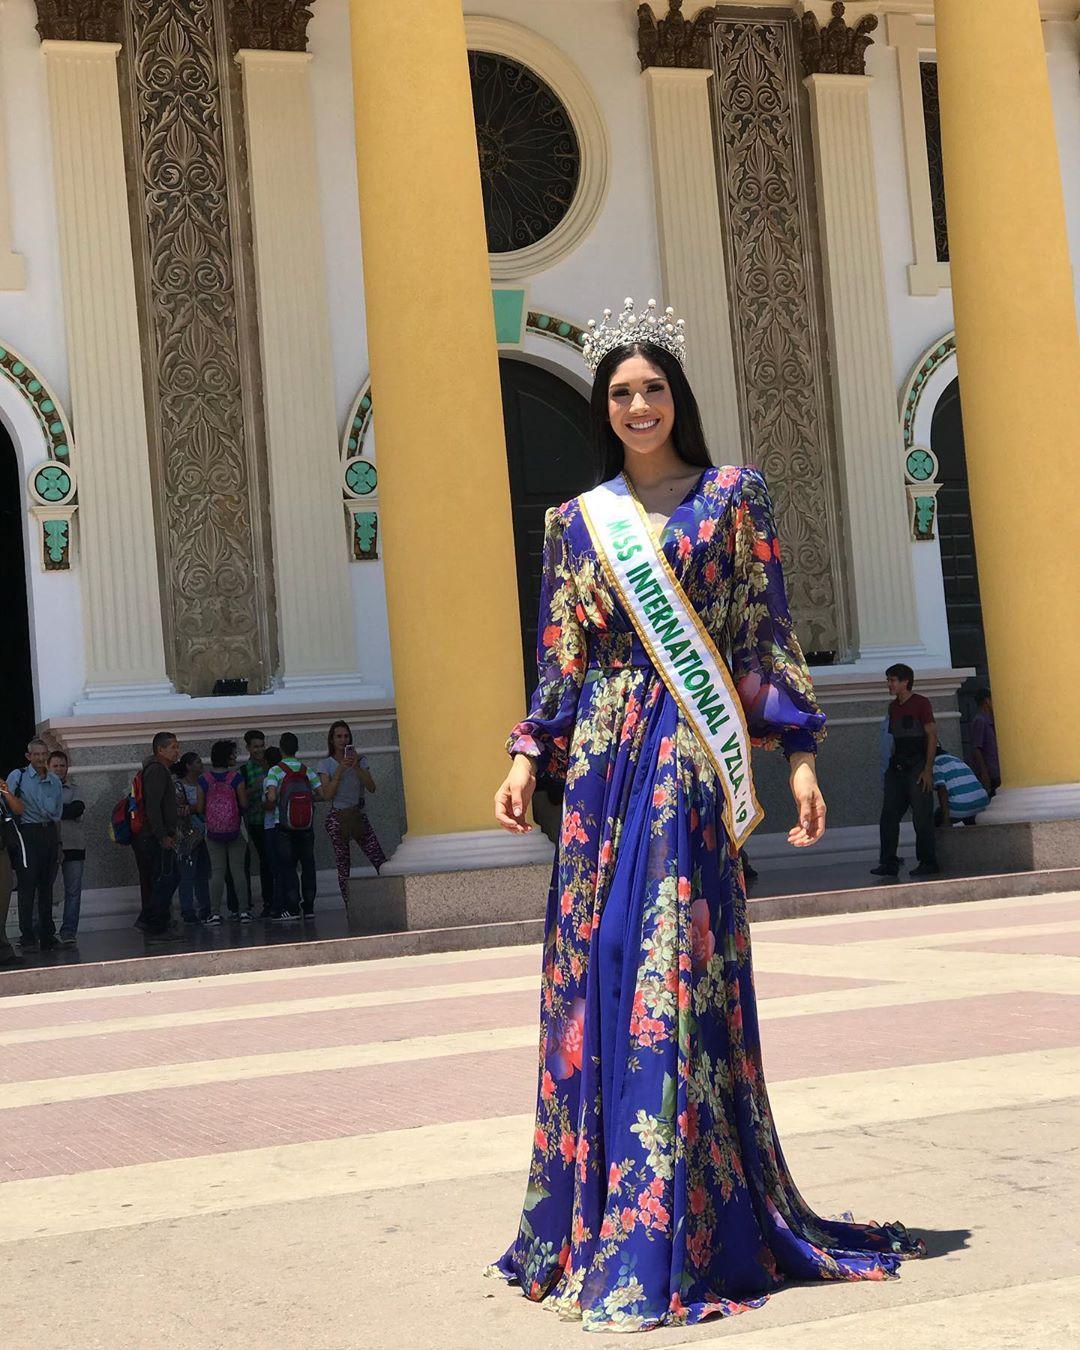 melissa jimenez, top 15 de miss international 2019. 69857711